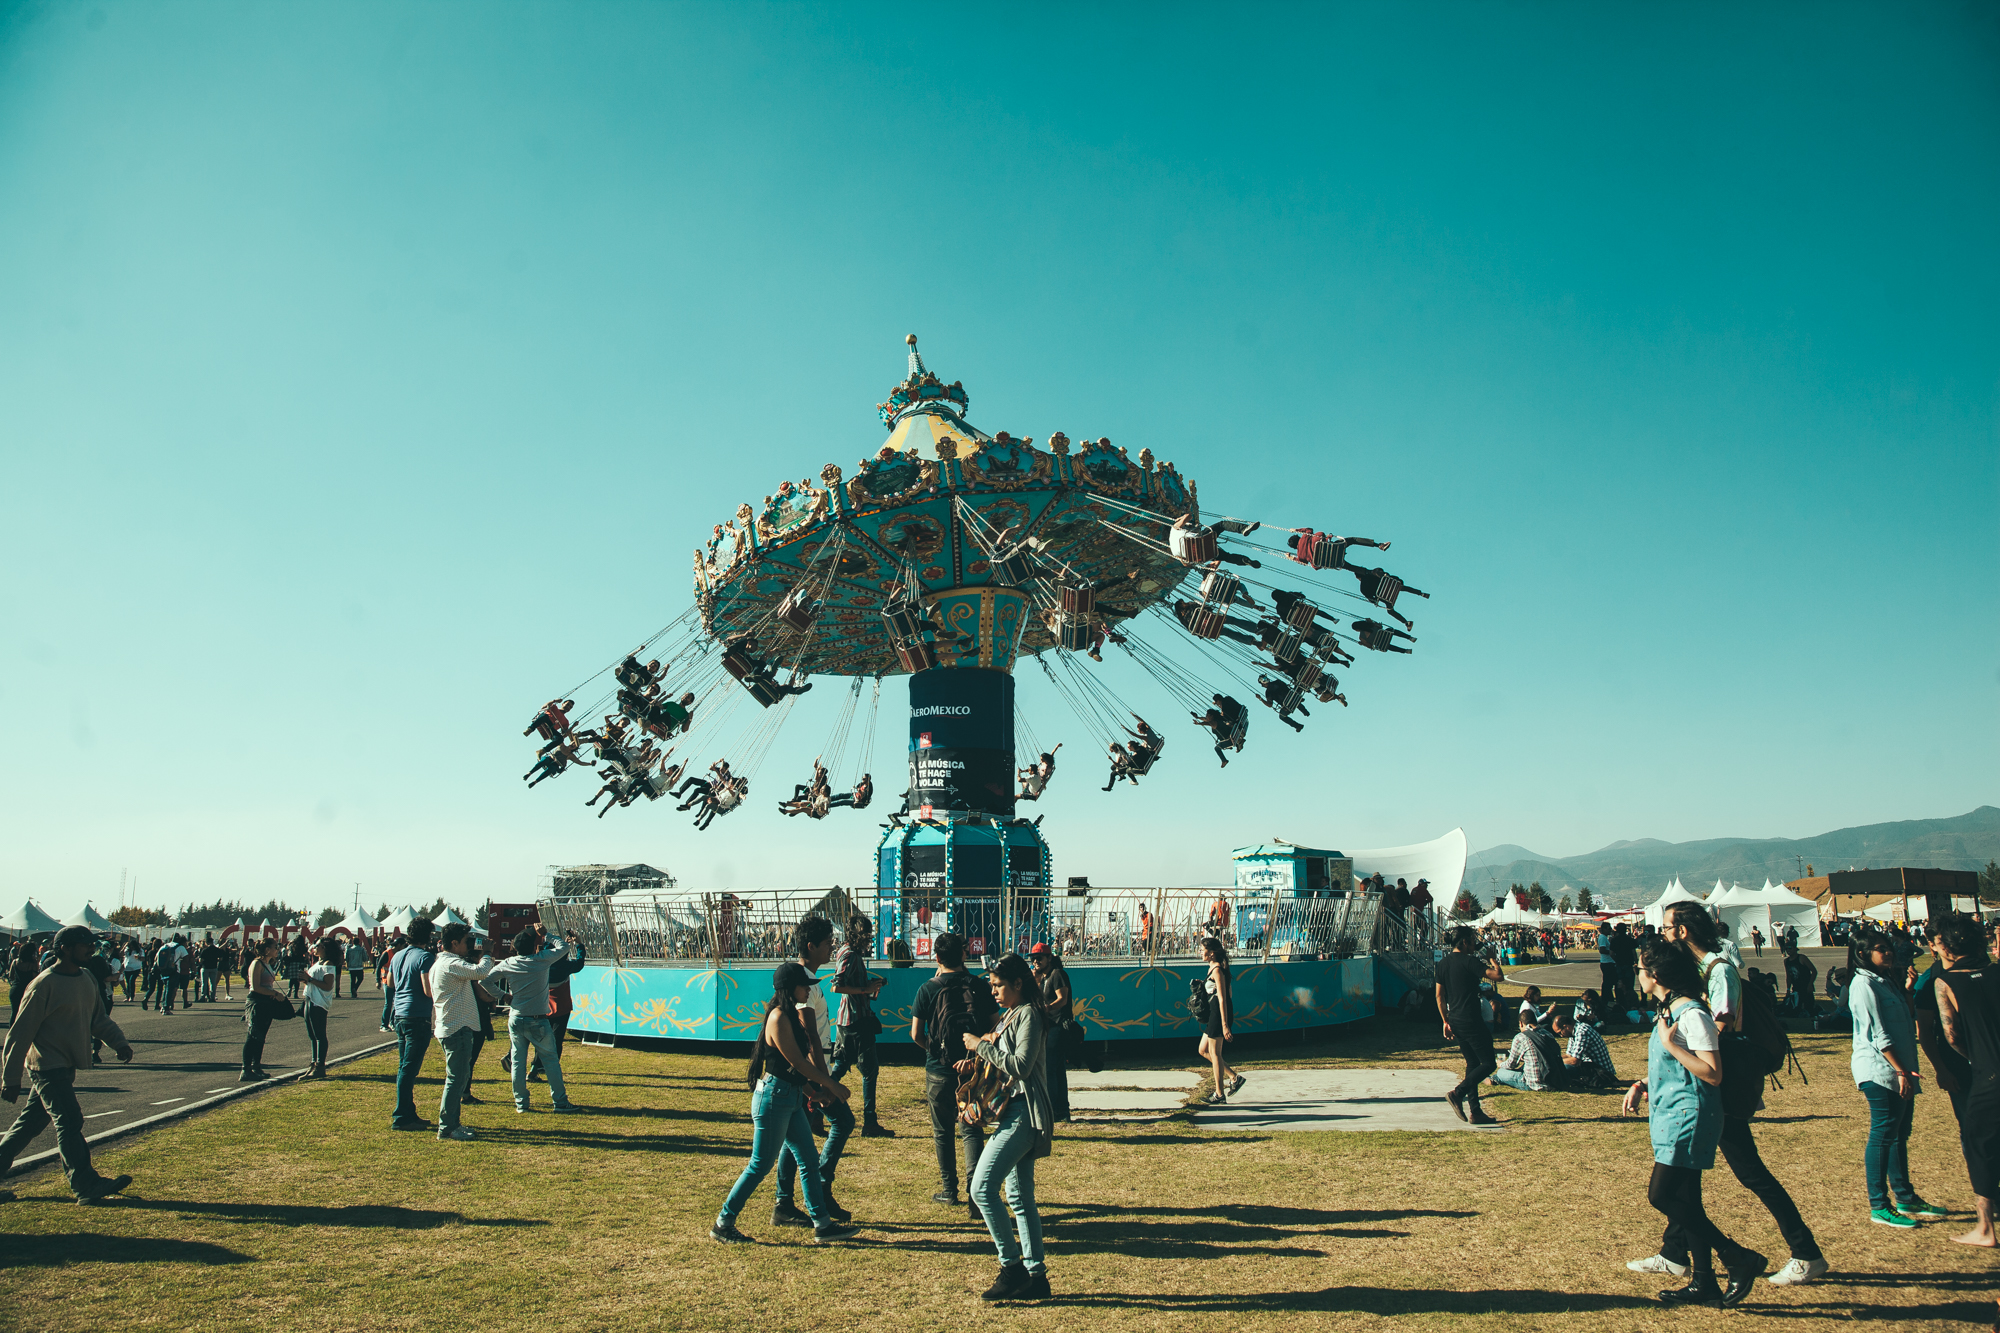 Crowd-Festival Ceremonia-Mexico-Foro Pegaso-04.02.2017-Daniel Patlan_Desde 1989 (12 of 49).jpg